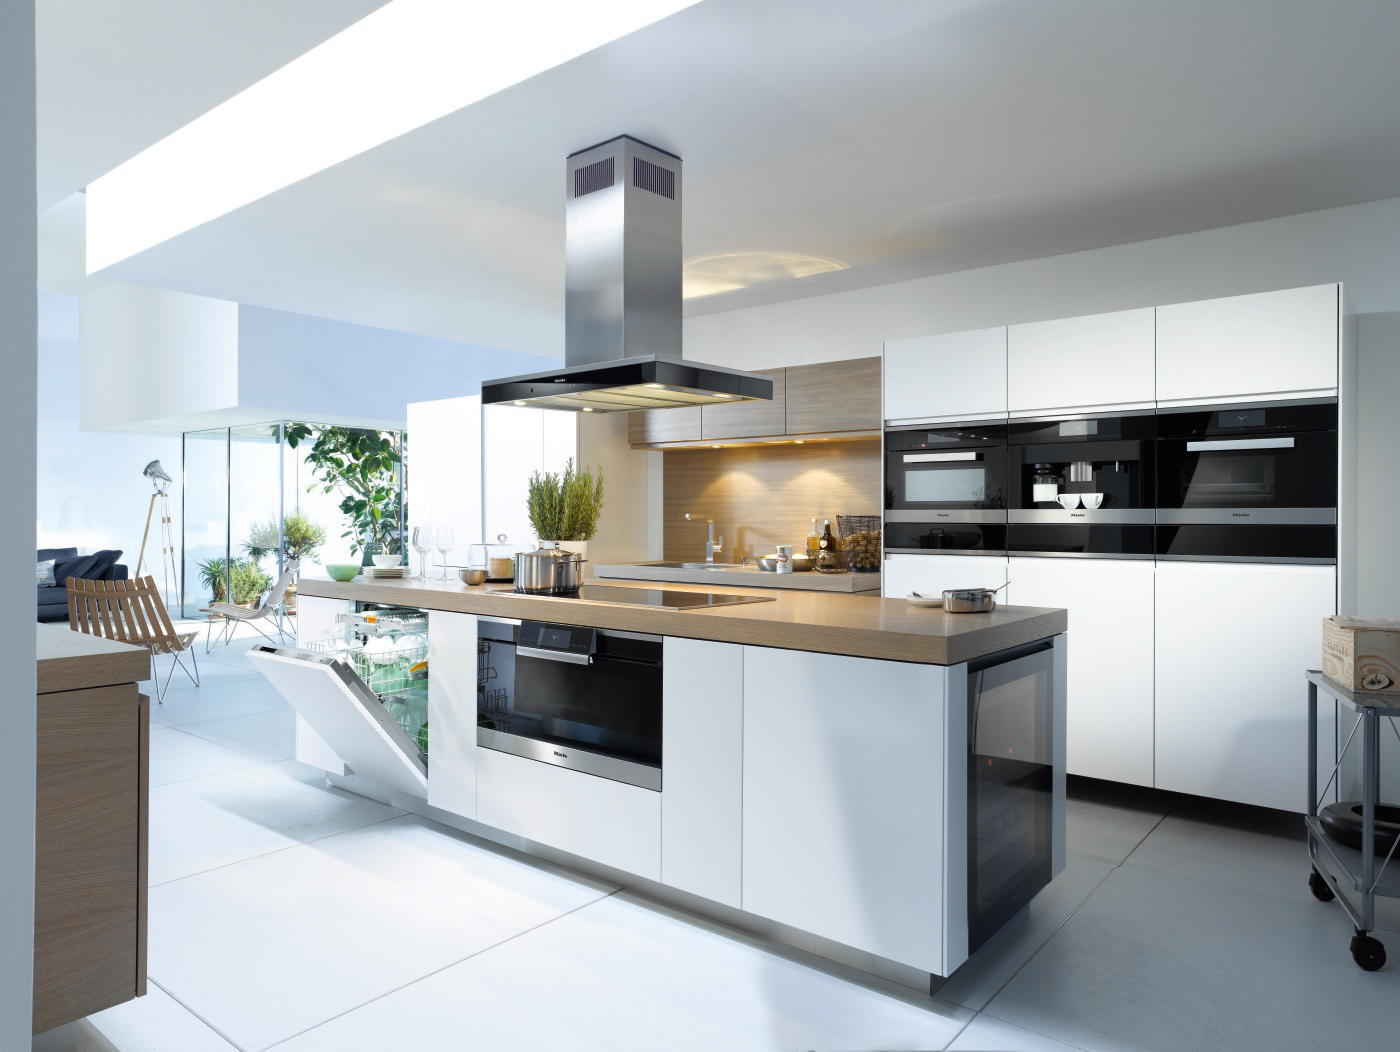 Miele steam oven combination miele kitchen appliances for Miele küchen